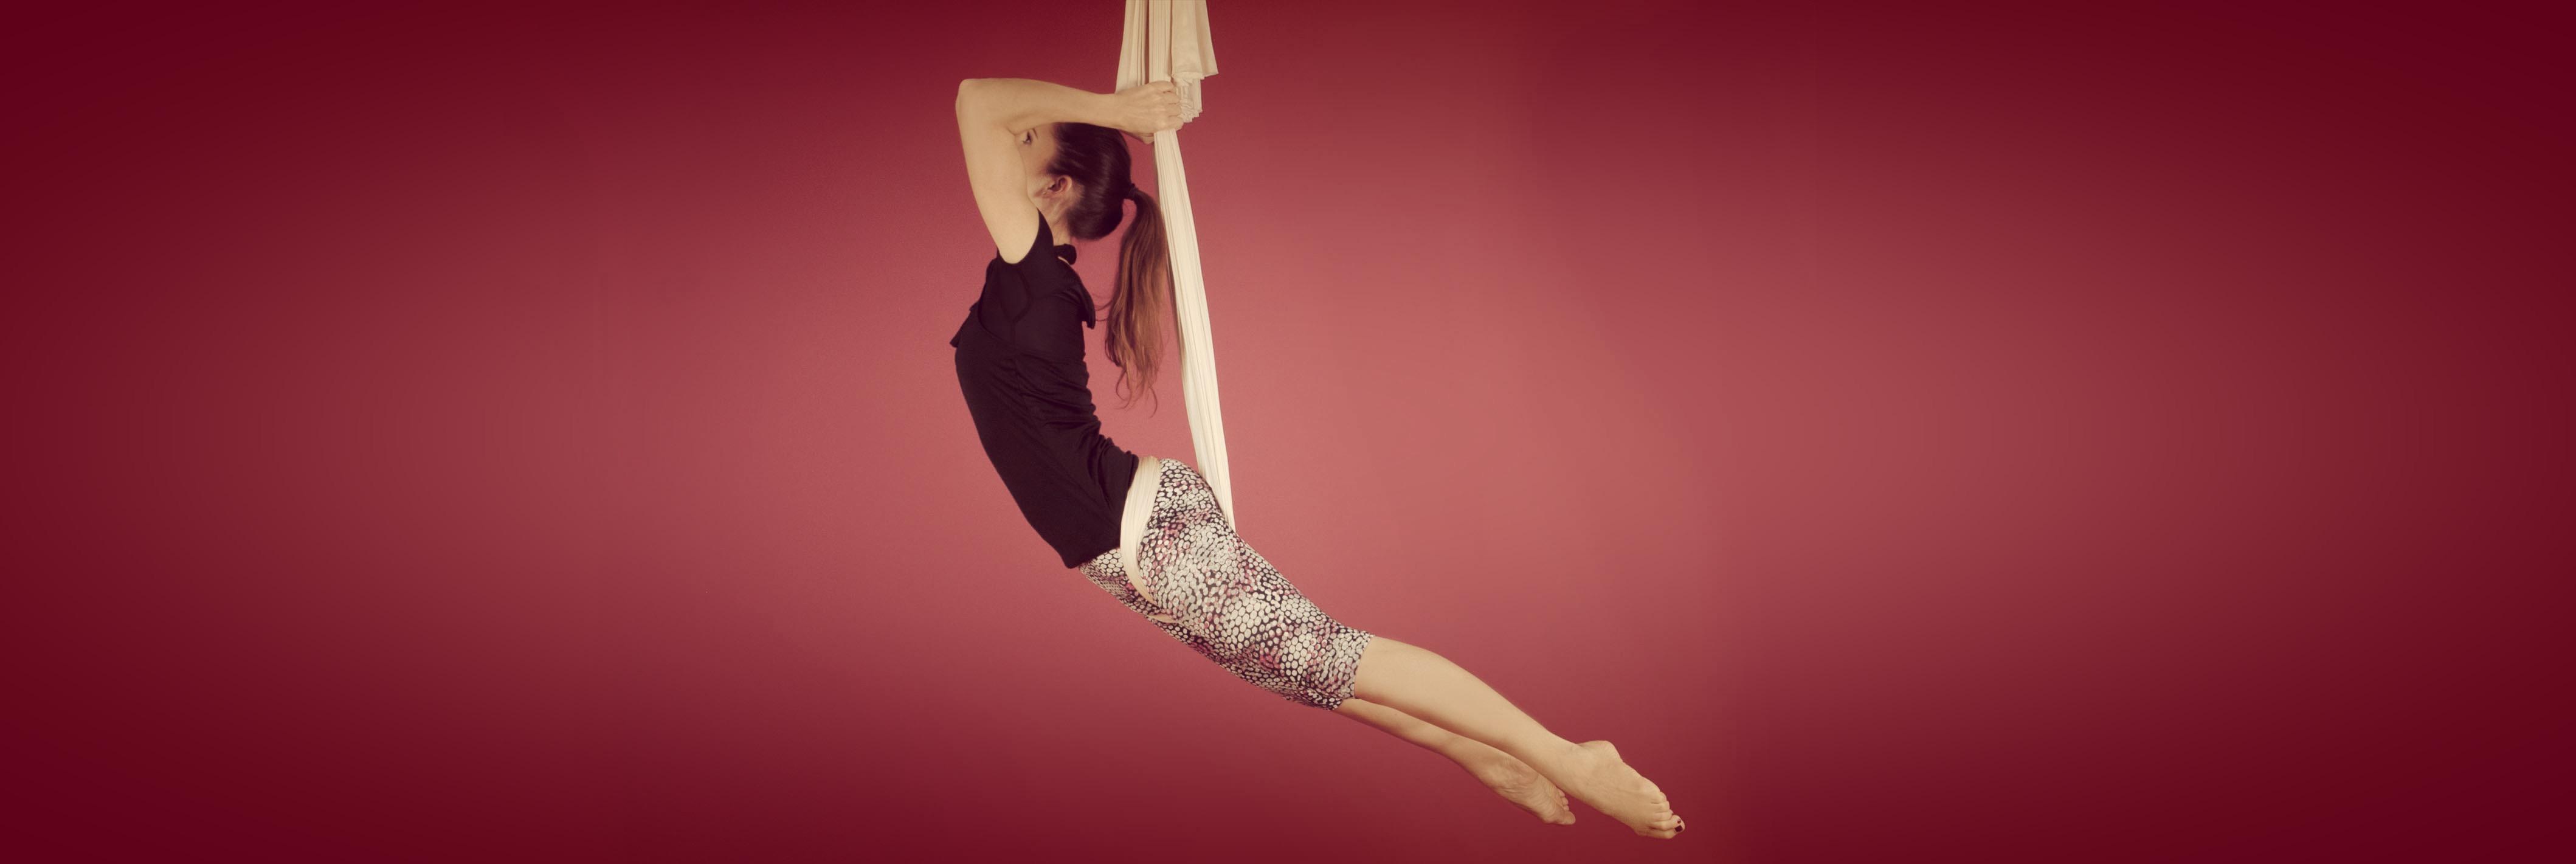 Studio-Elodie-Murnau-Aerial-Yoga-02